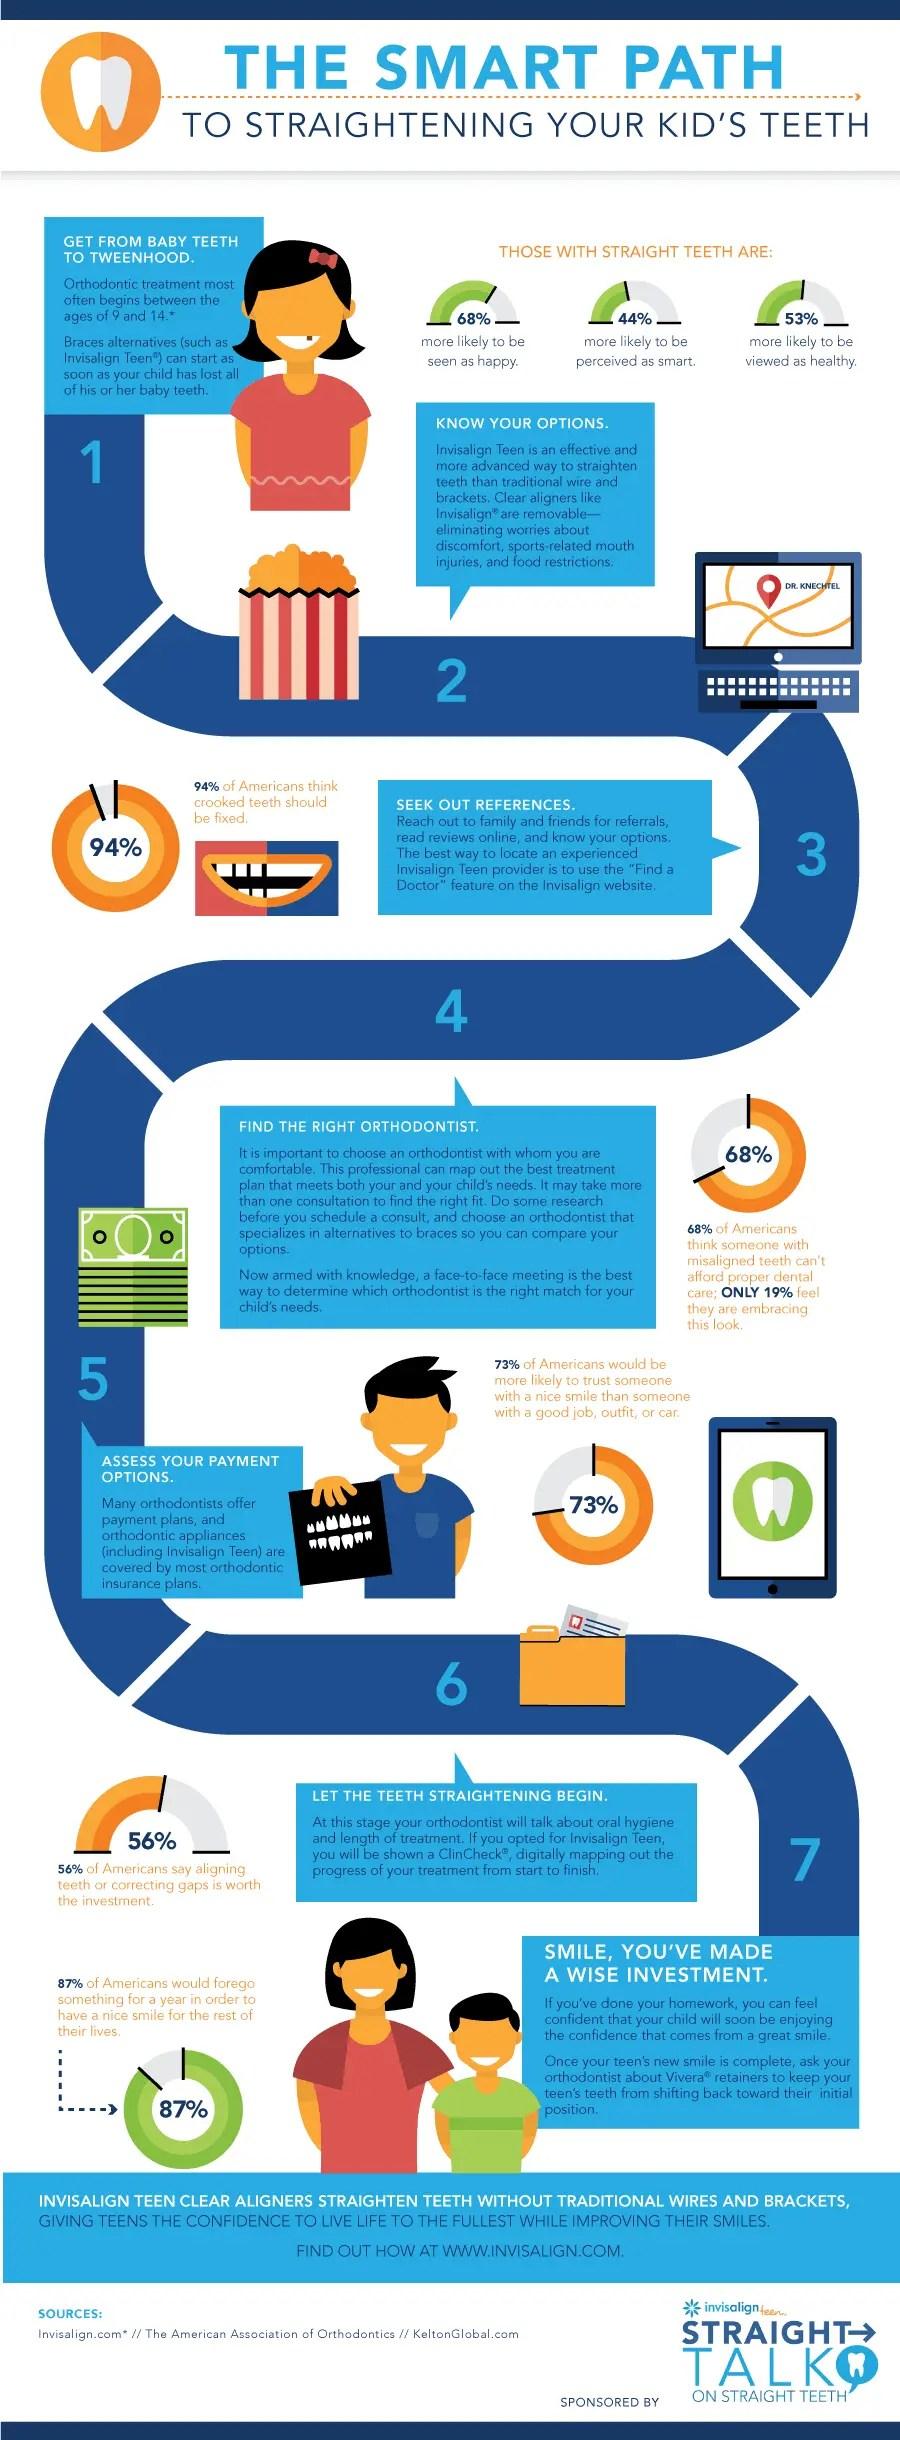 content_StraightTalk-Invisalign-Infographic